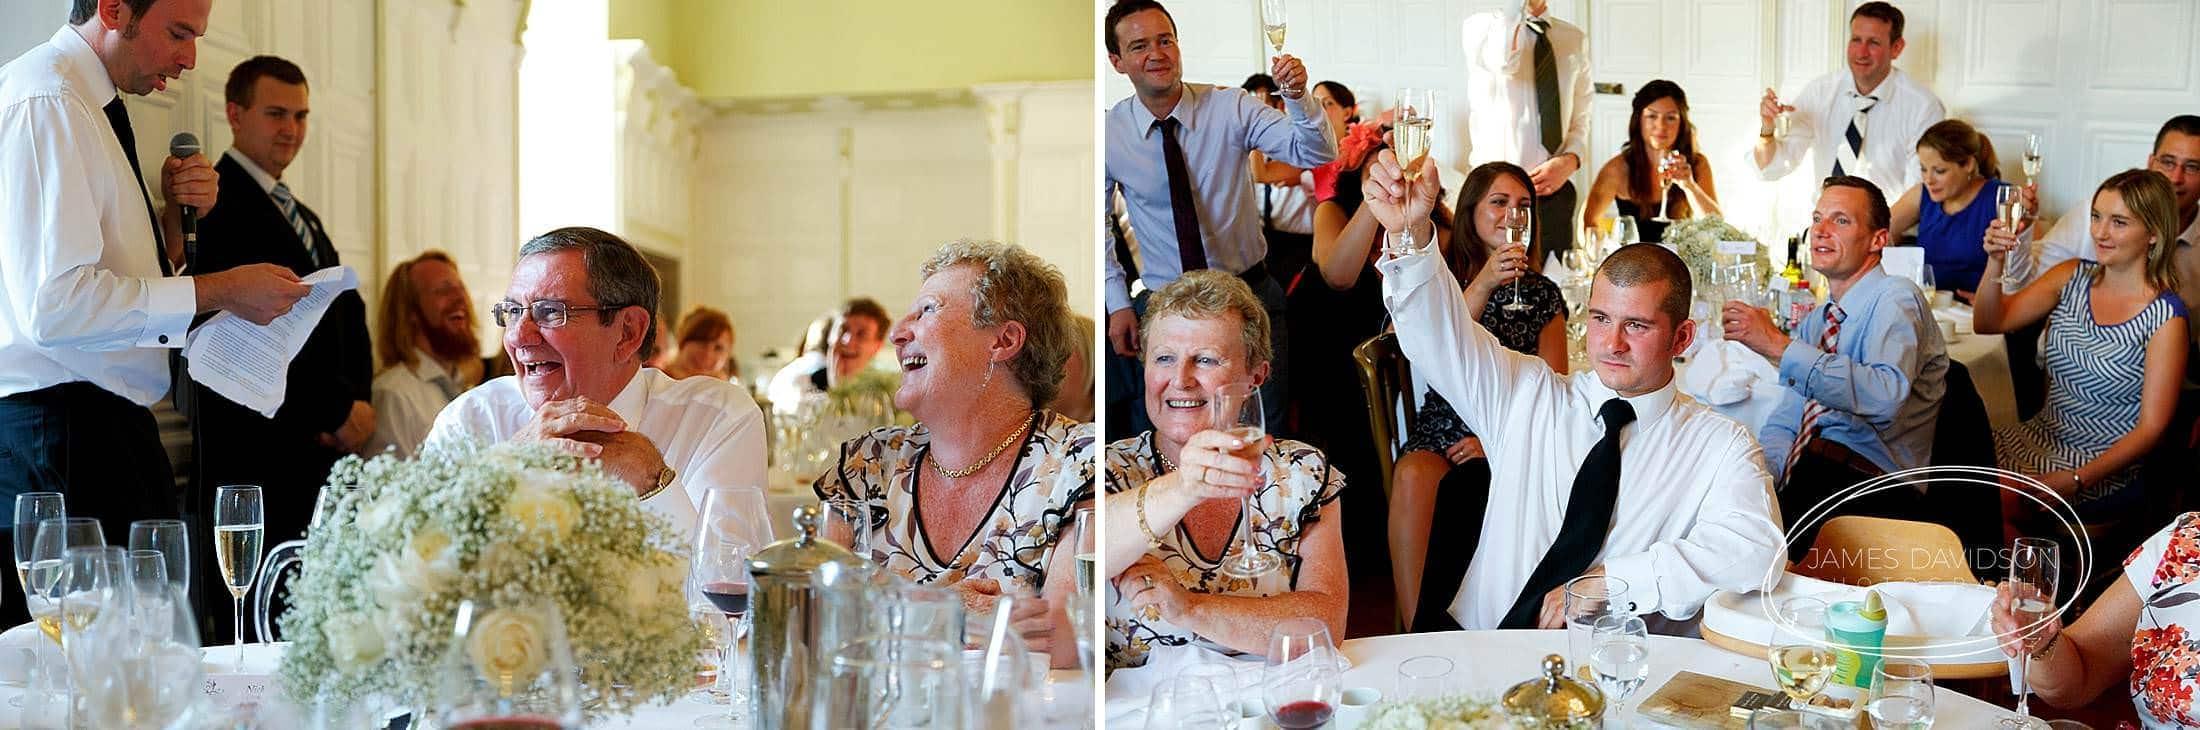 hengrave-hall-summer-wedding-081